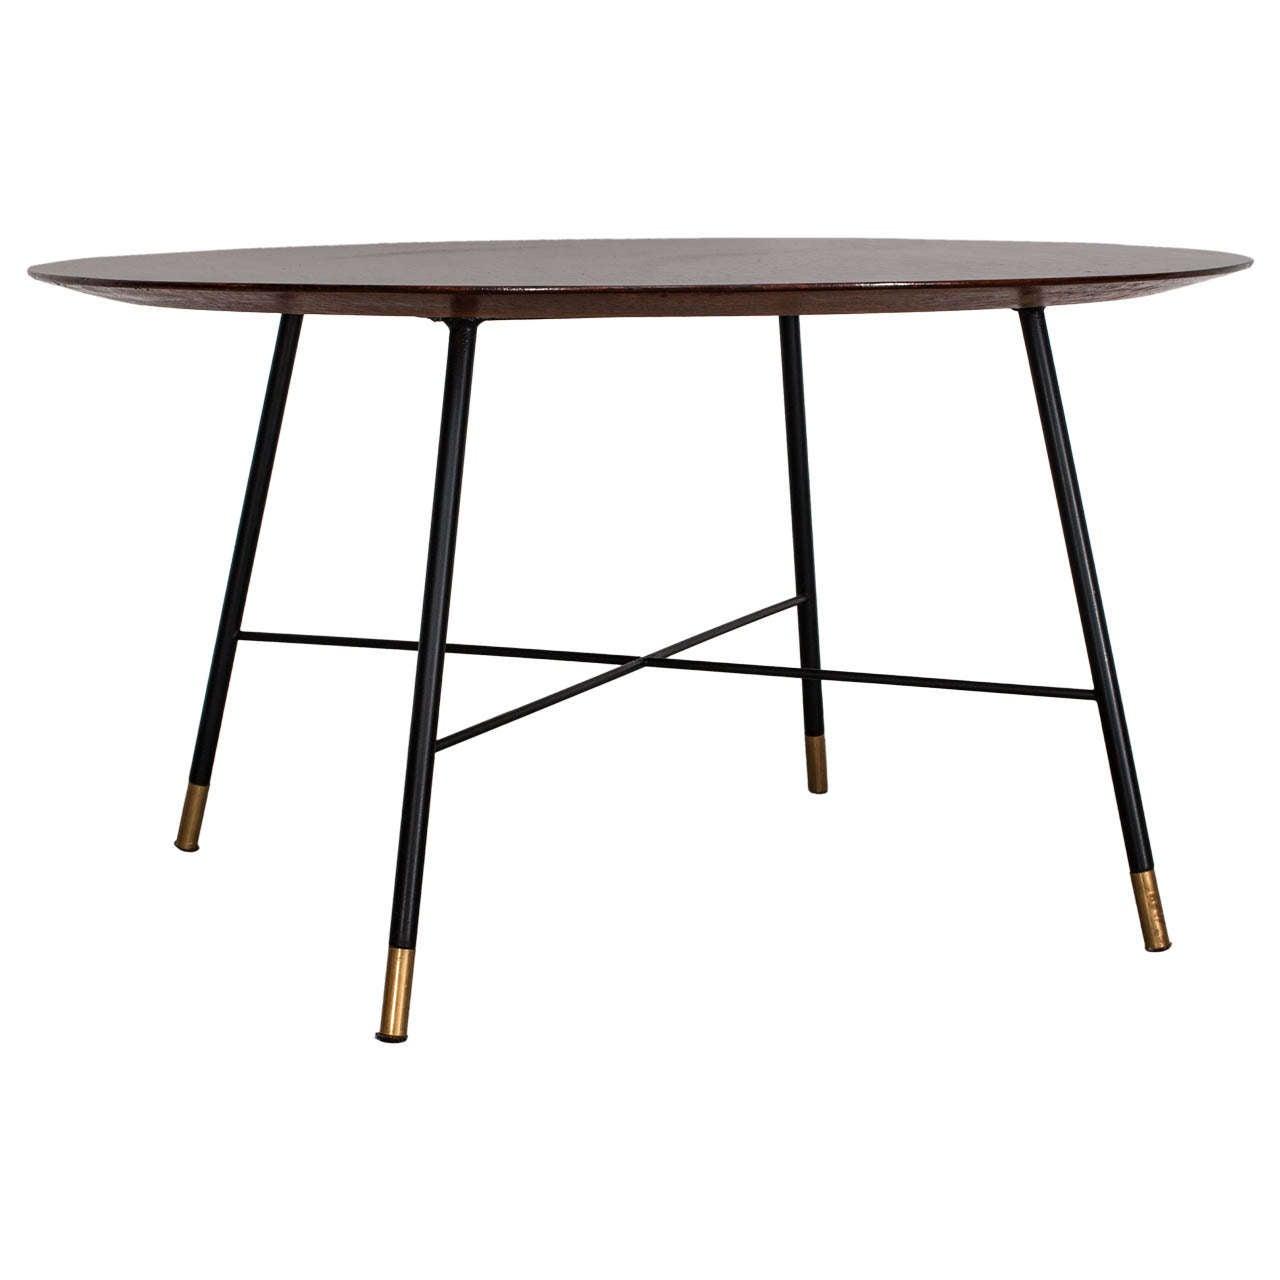 ico parisi coffee table at 1stdibs